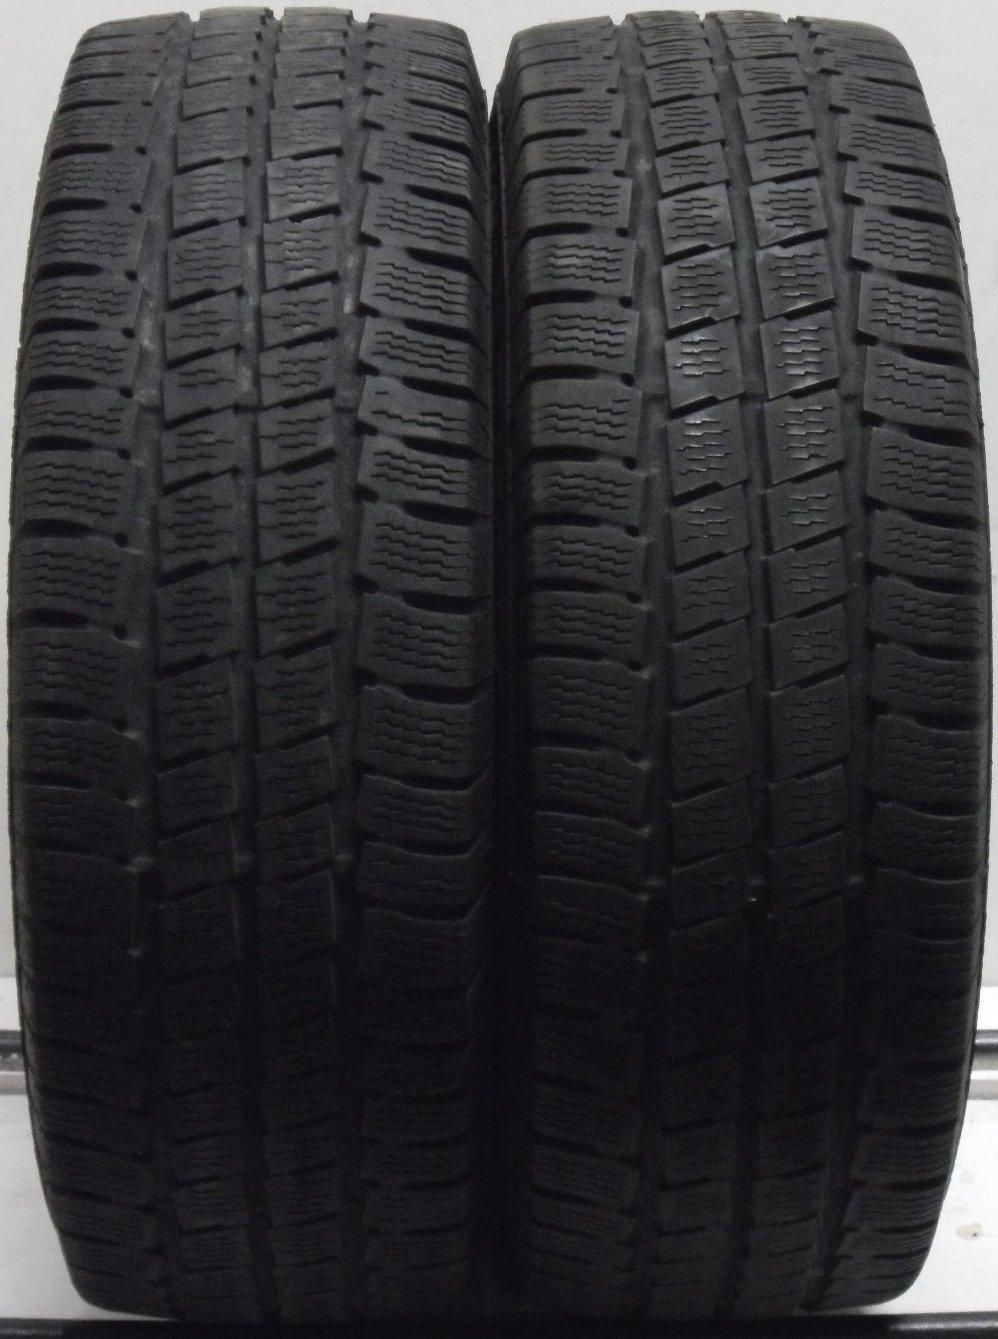 2 2156516 Uniroyal 215 65 16 Van Winter Part Worn Tyres Snow Max x2 Two 5mm-6mm